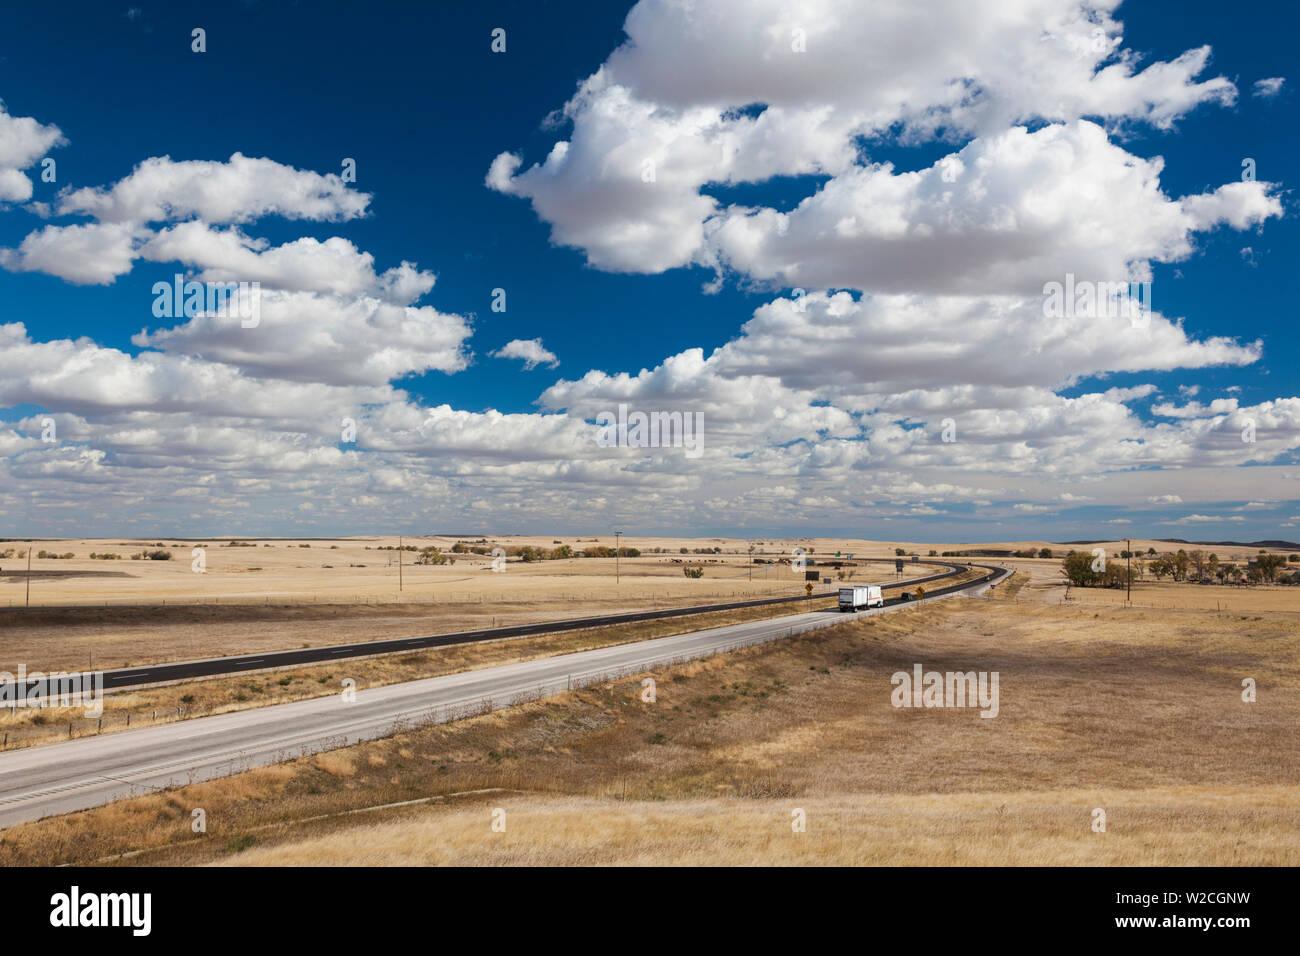 Estados Unidos, South Dakota, Cactus, plana vista elevada de la autopista interestatal I-90 Imagen De Stock